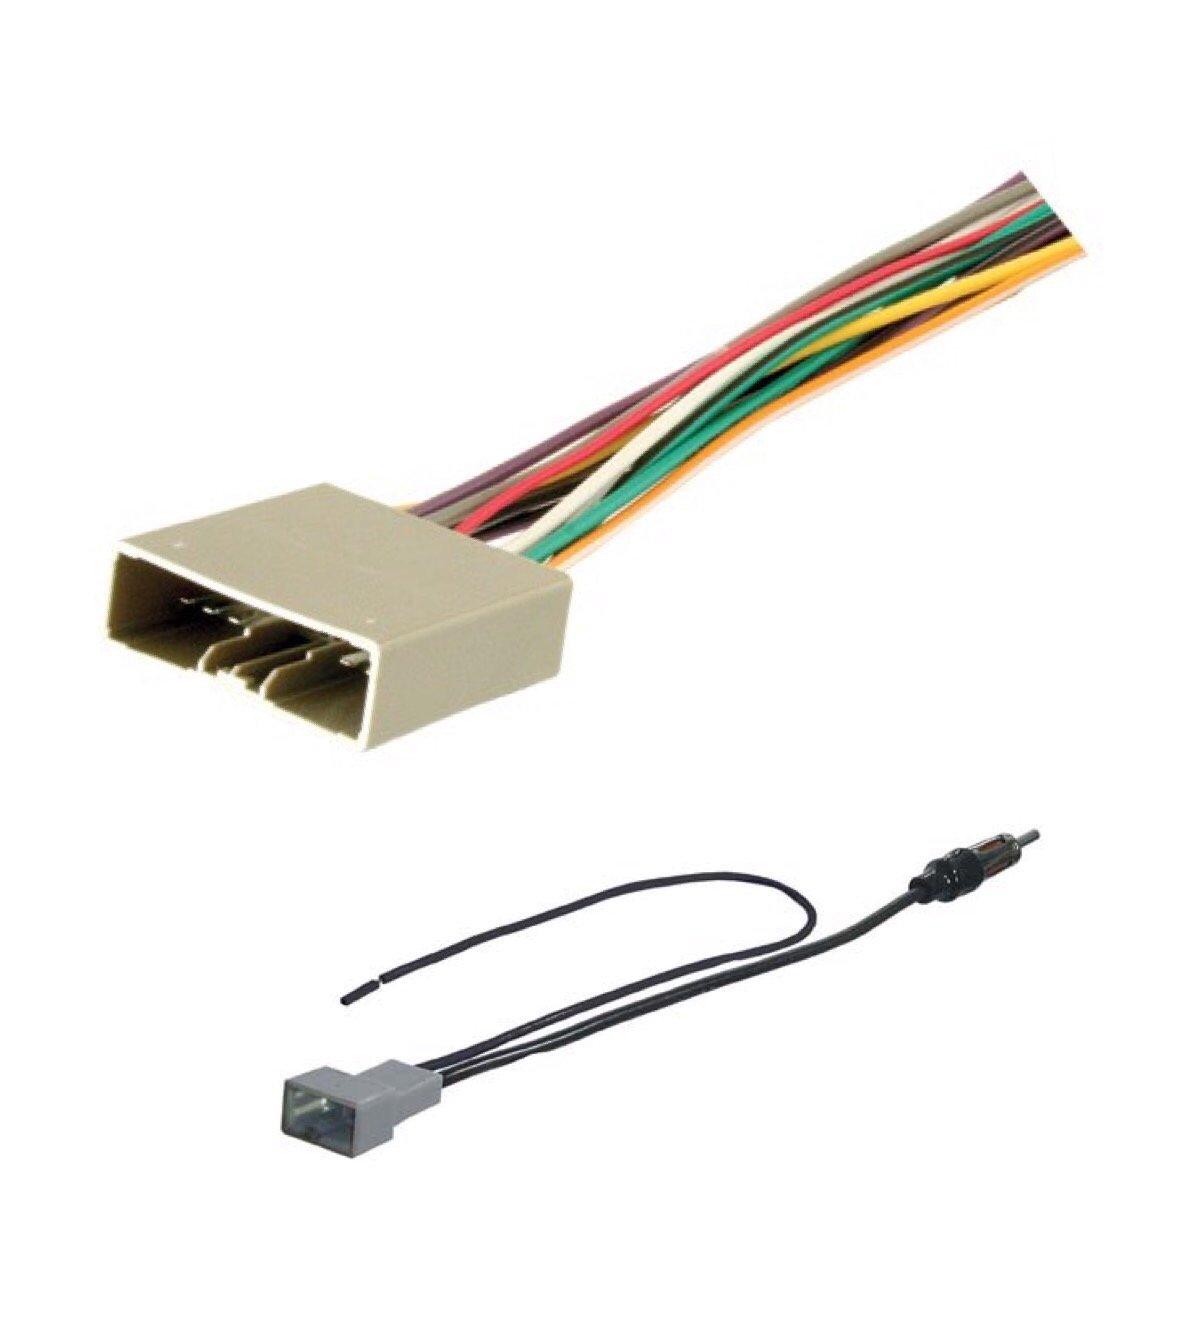 asc audio car stereo radio wire harness and antenna adapter to aftermarket radio for 2006 2011 honda civic (no nav, no dx model), 2007 2011 honda cr v Headlight Harness Adapter